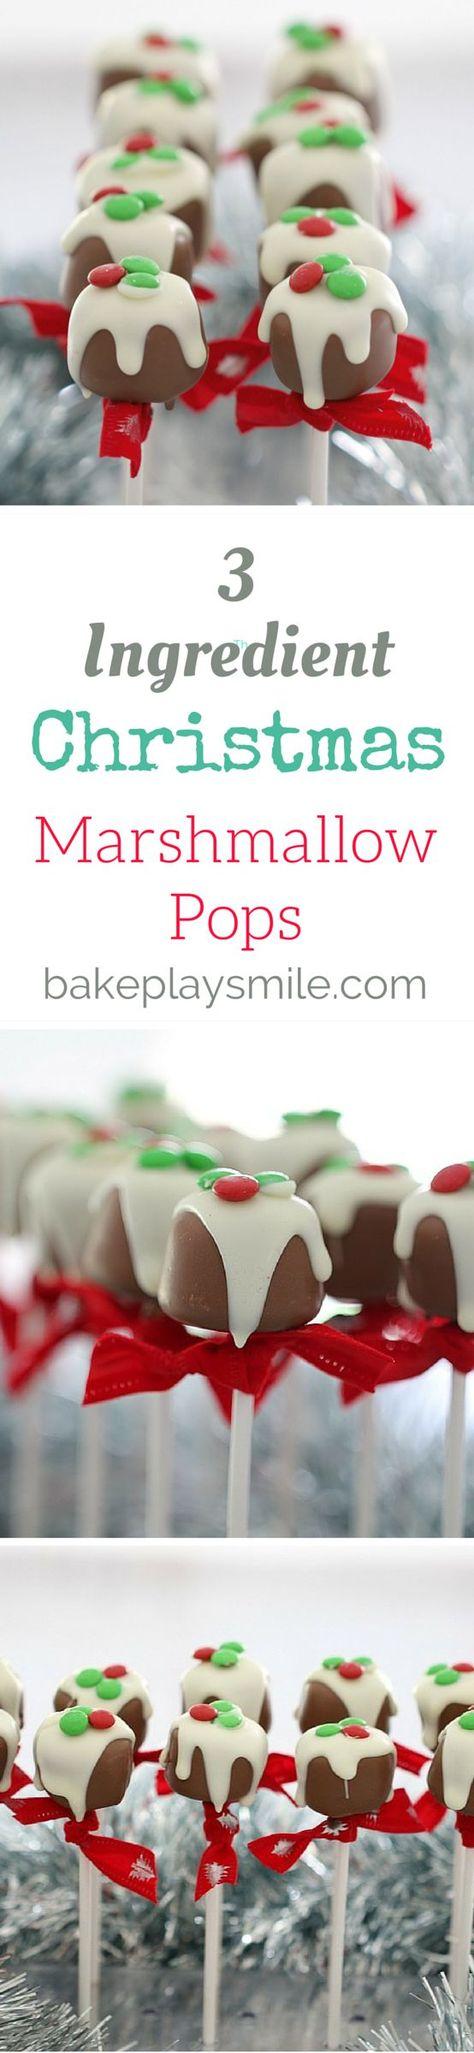 Christmas marshmallow pops recipe marshmallow and recipes